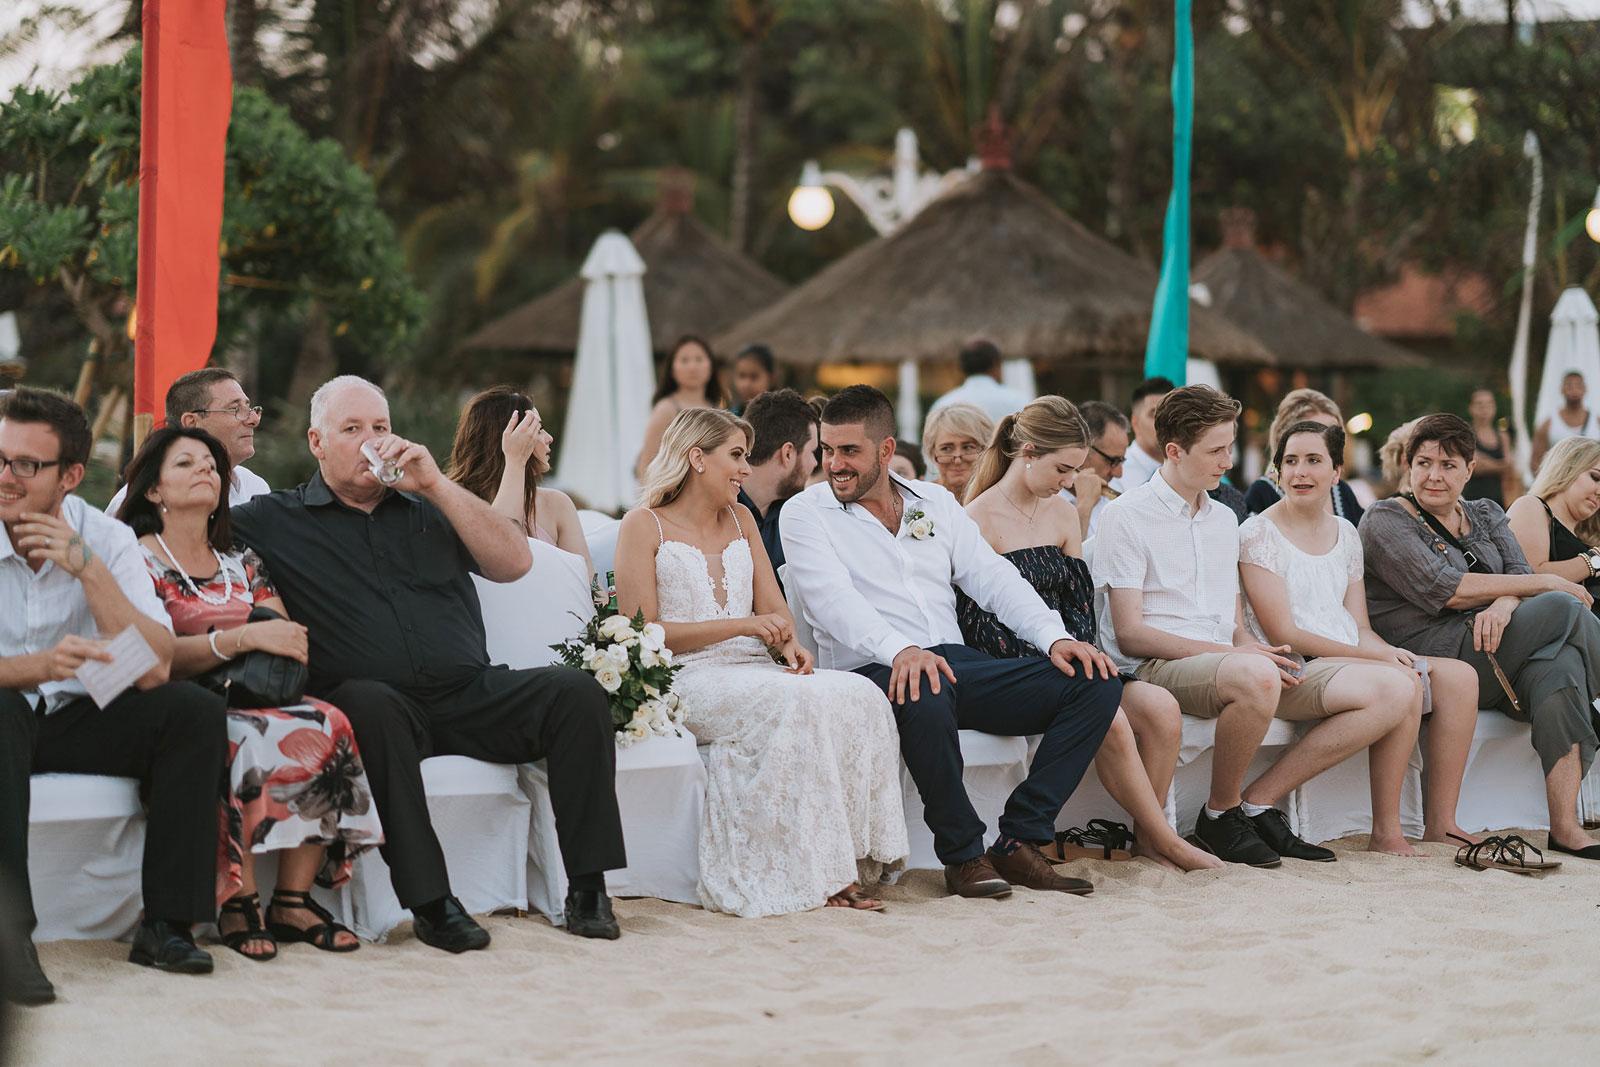 newfound-j-j-bali-nusa-dua-wedding-wedding-photographer-070-a